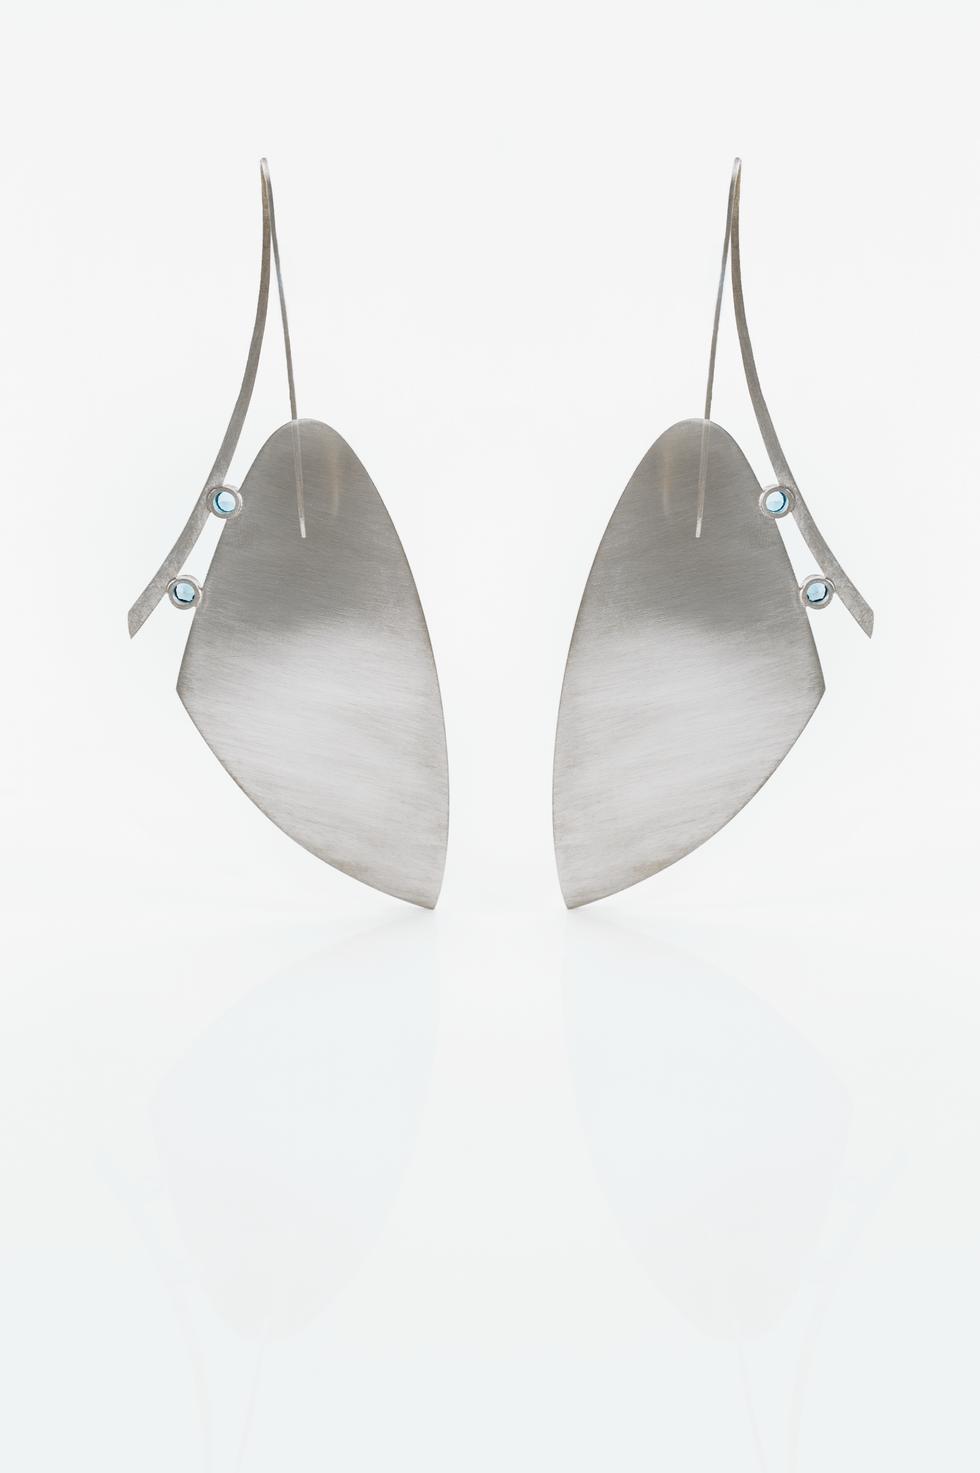 cloisonne-earrings-1.png